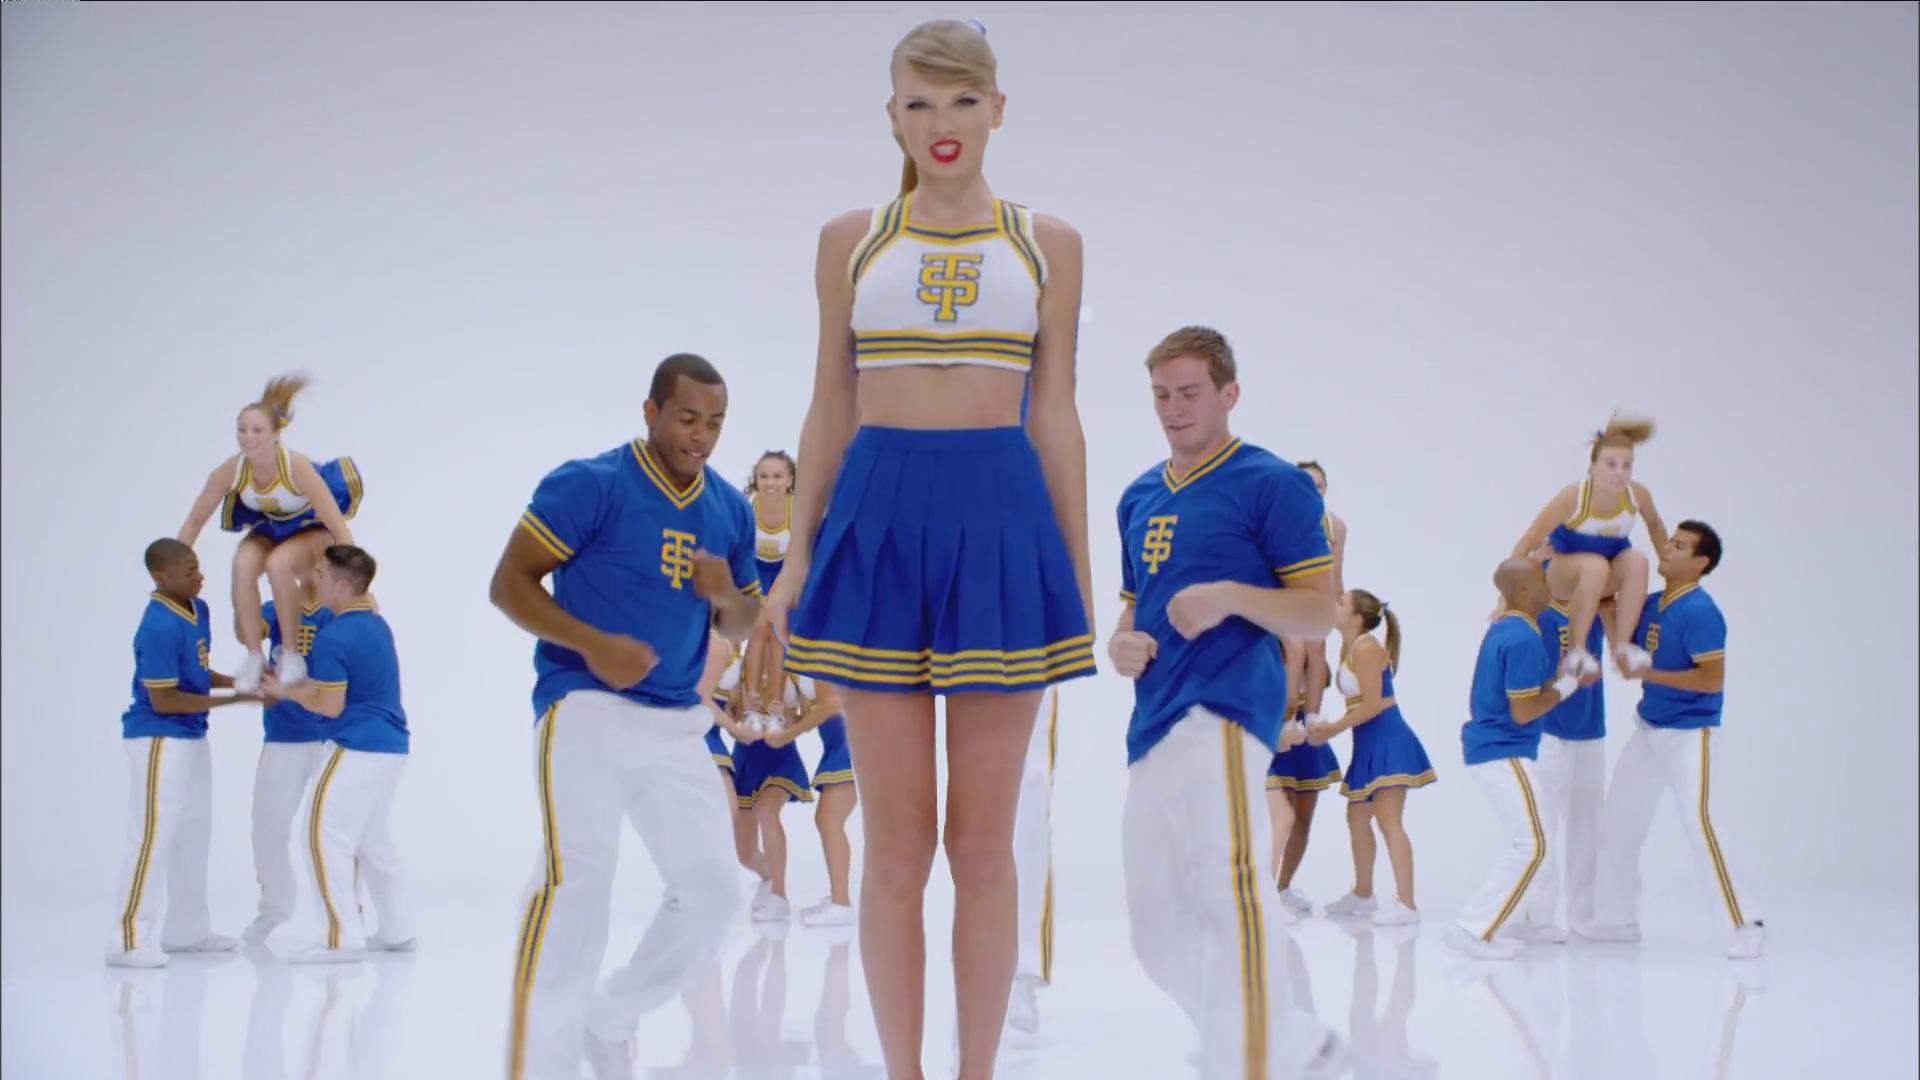 Taylor Swift Giant Cheerleader by Cloverfield12 on DeviantArt